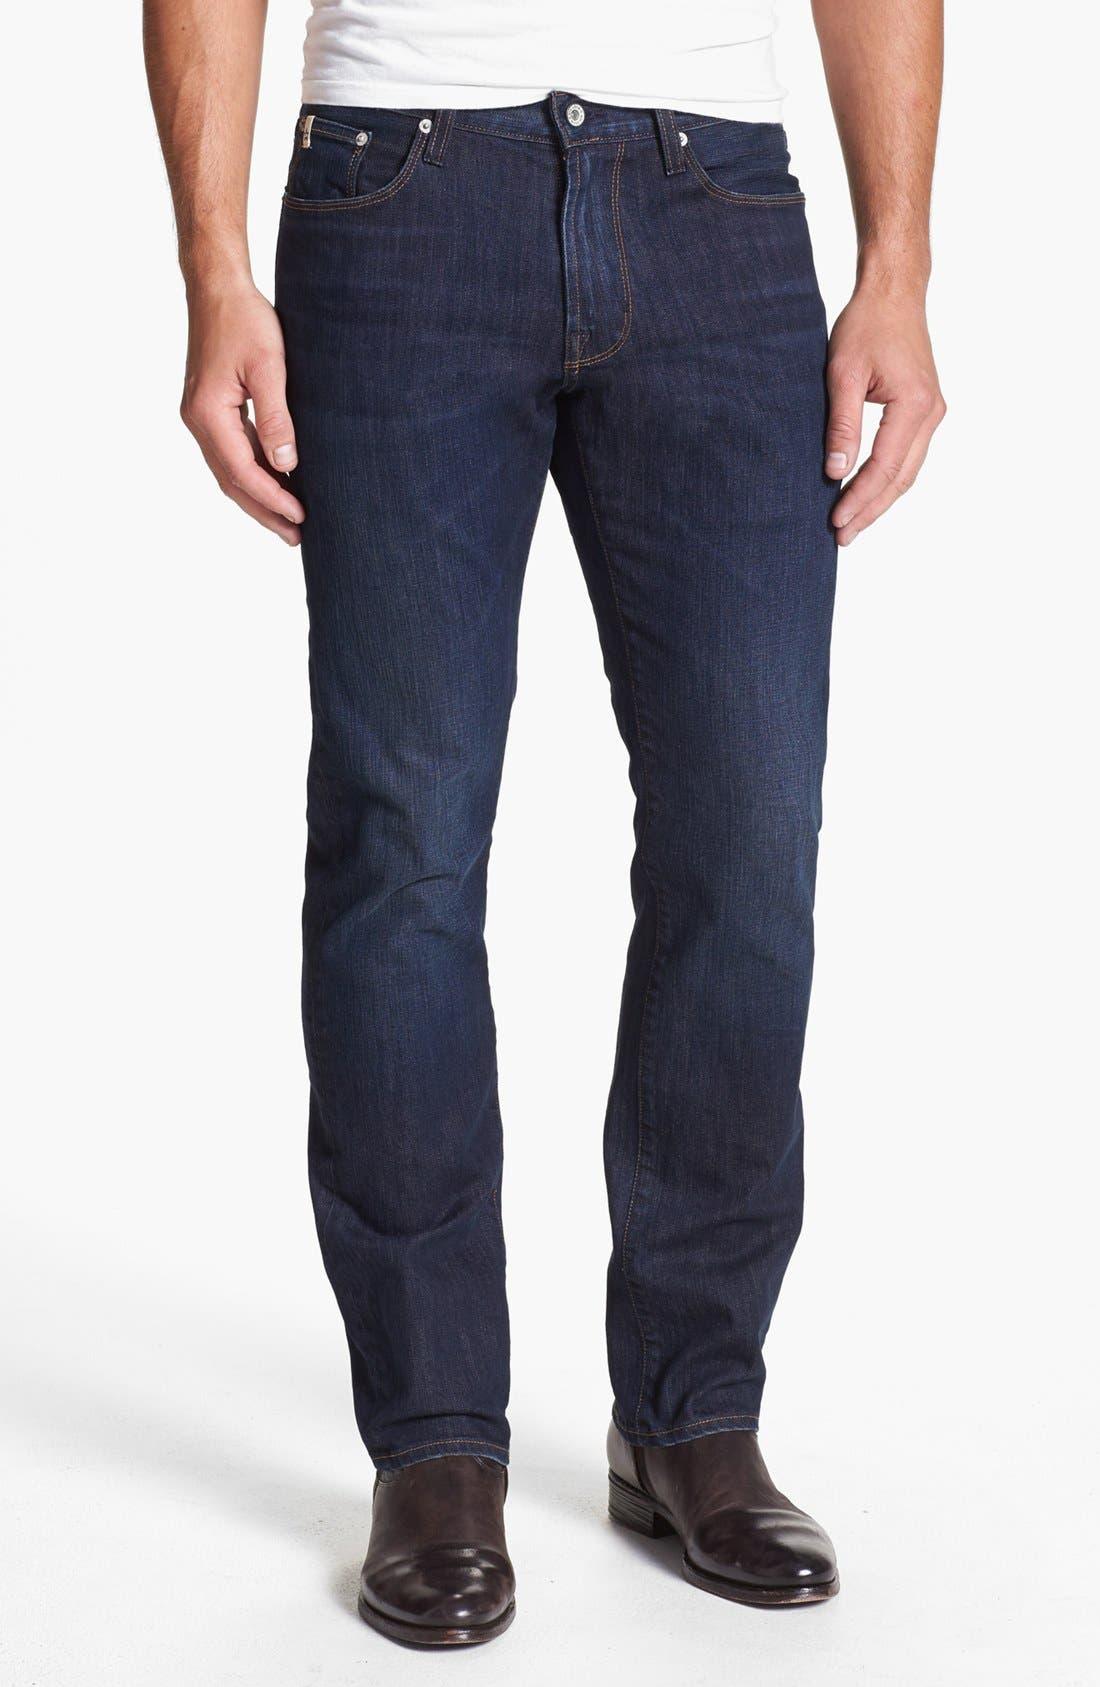 Alternate Image 1 Selected - Big Star 'Union' Regular Straight Leg Jeans (Curtis Dark)